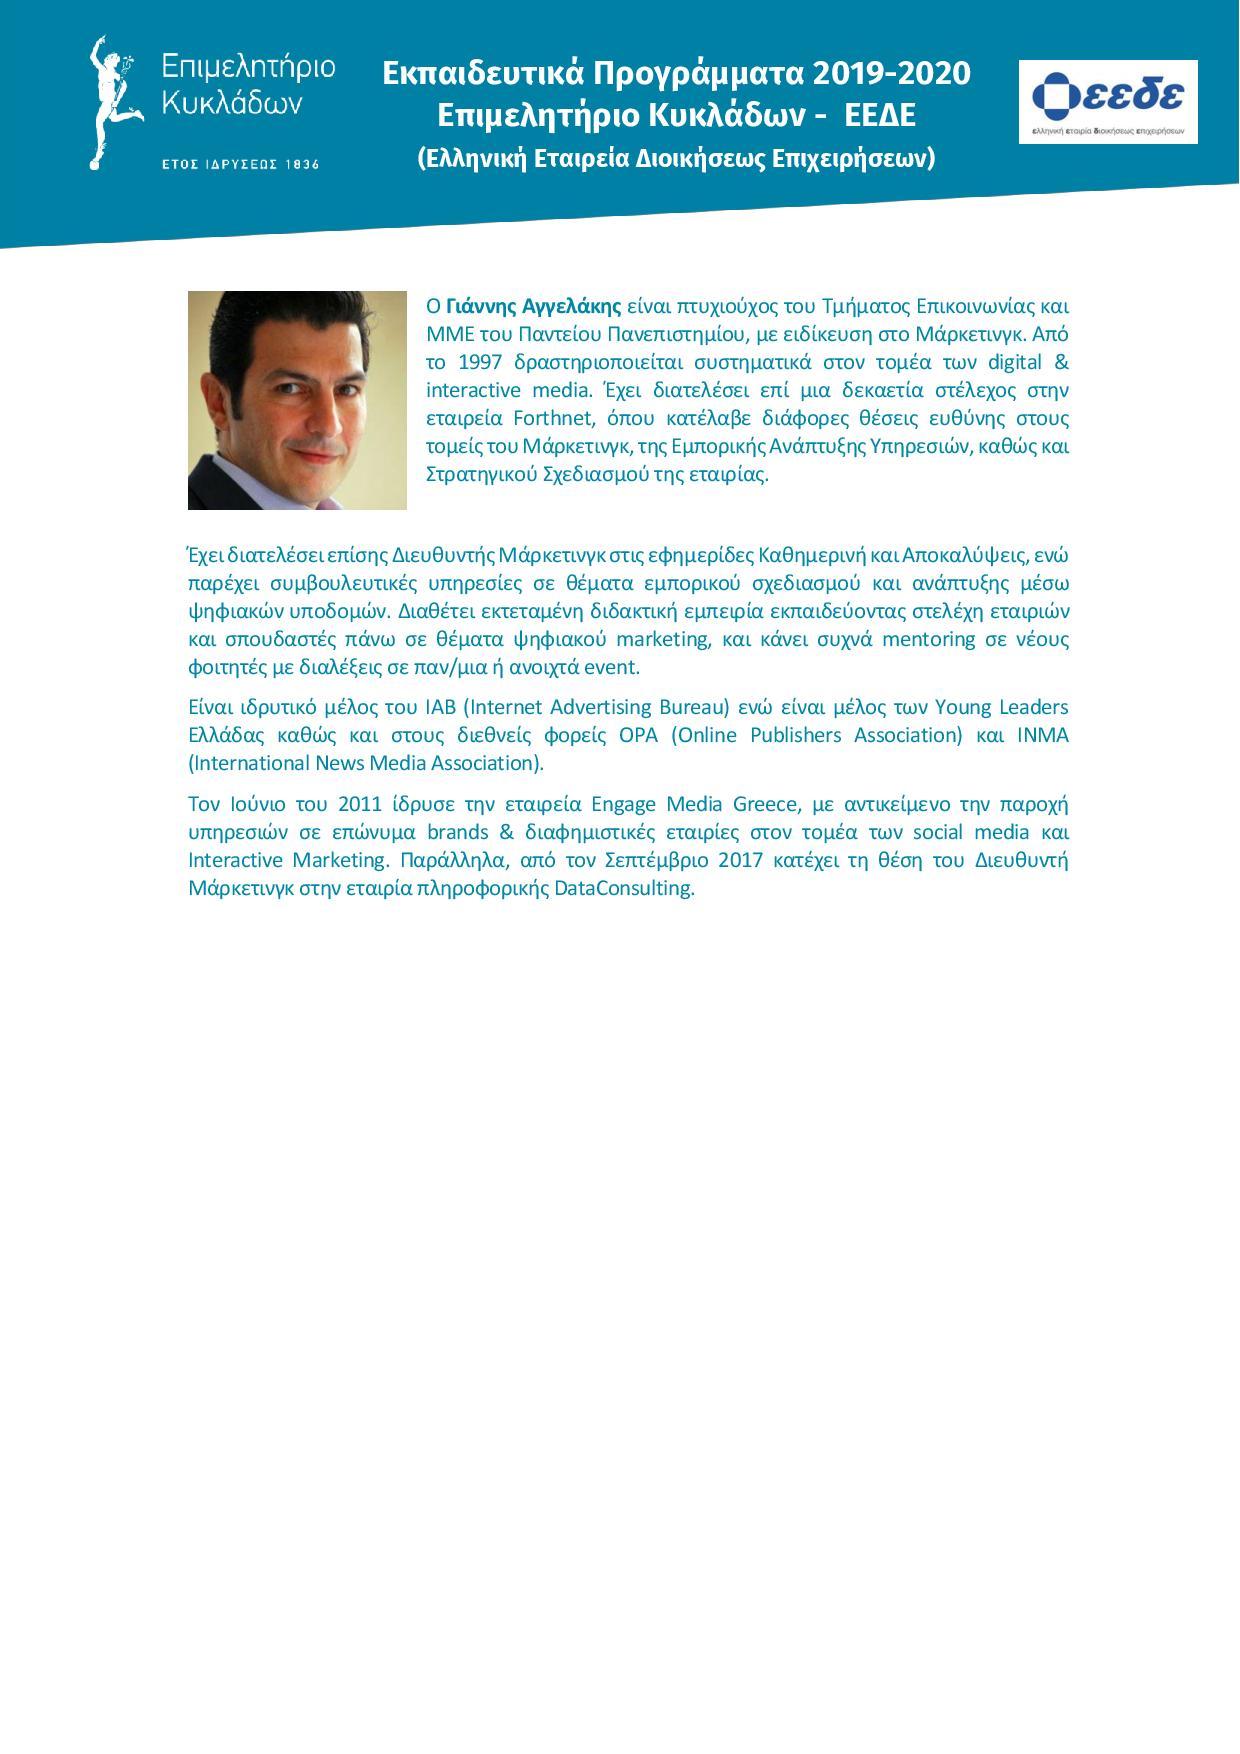 1_DigitalMarketing_Cyclades Chamber of Commerce_EEDE_seminars2019_2020-page-002